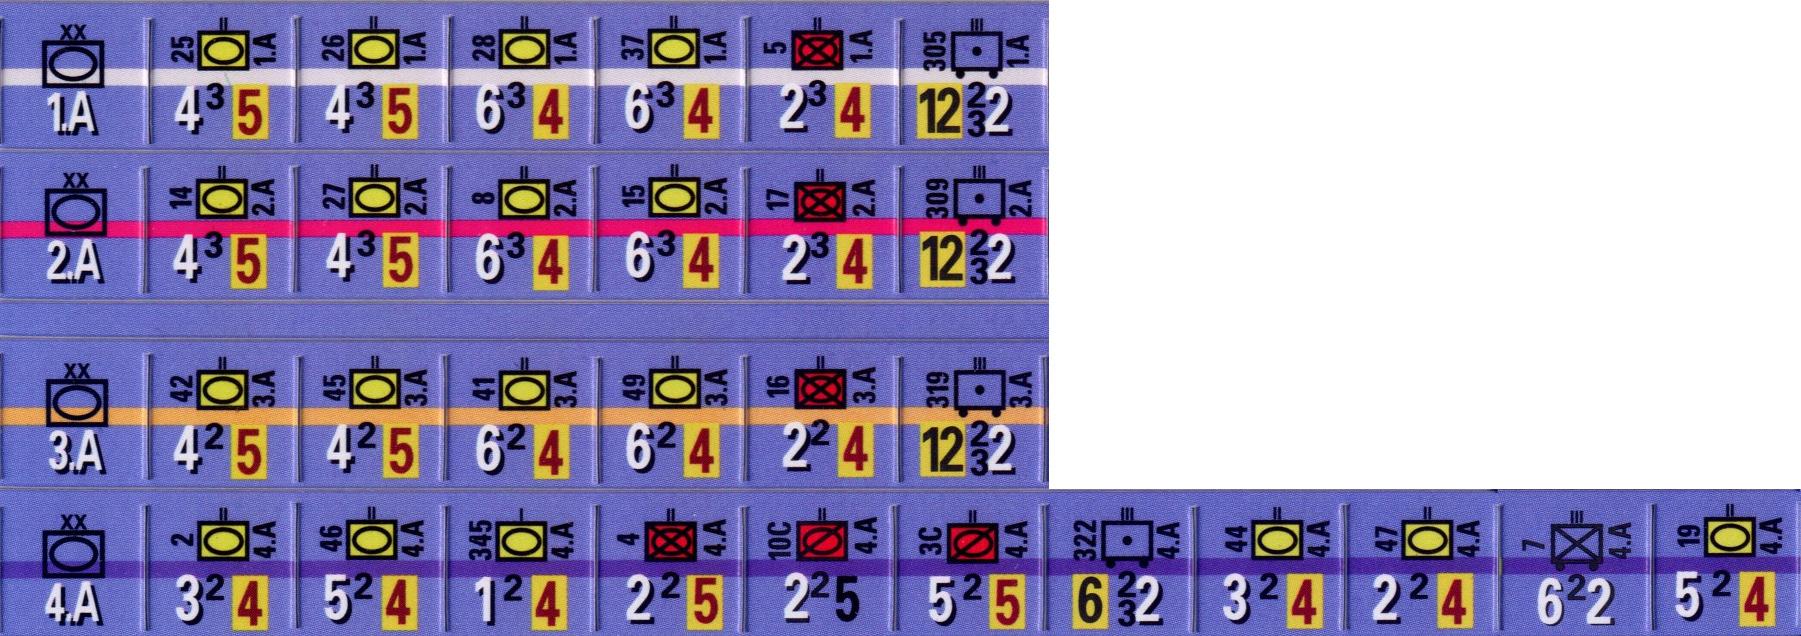 unit9867.jpg